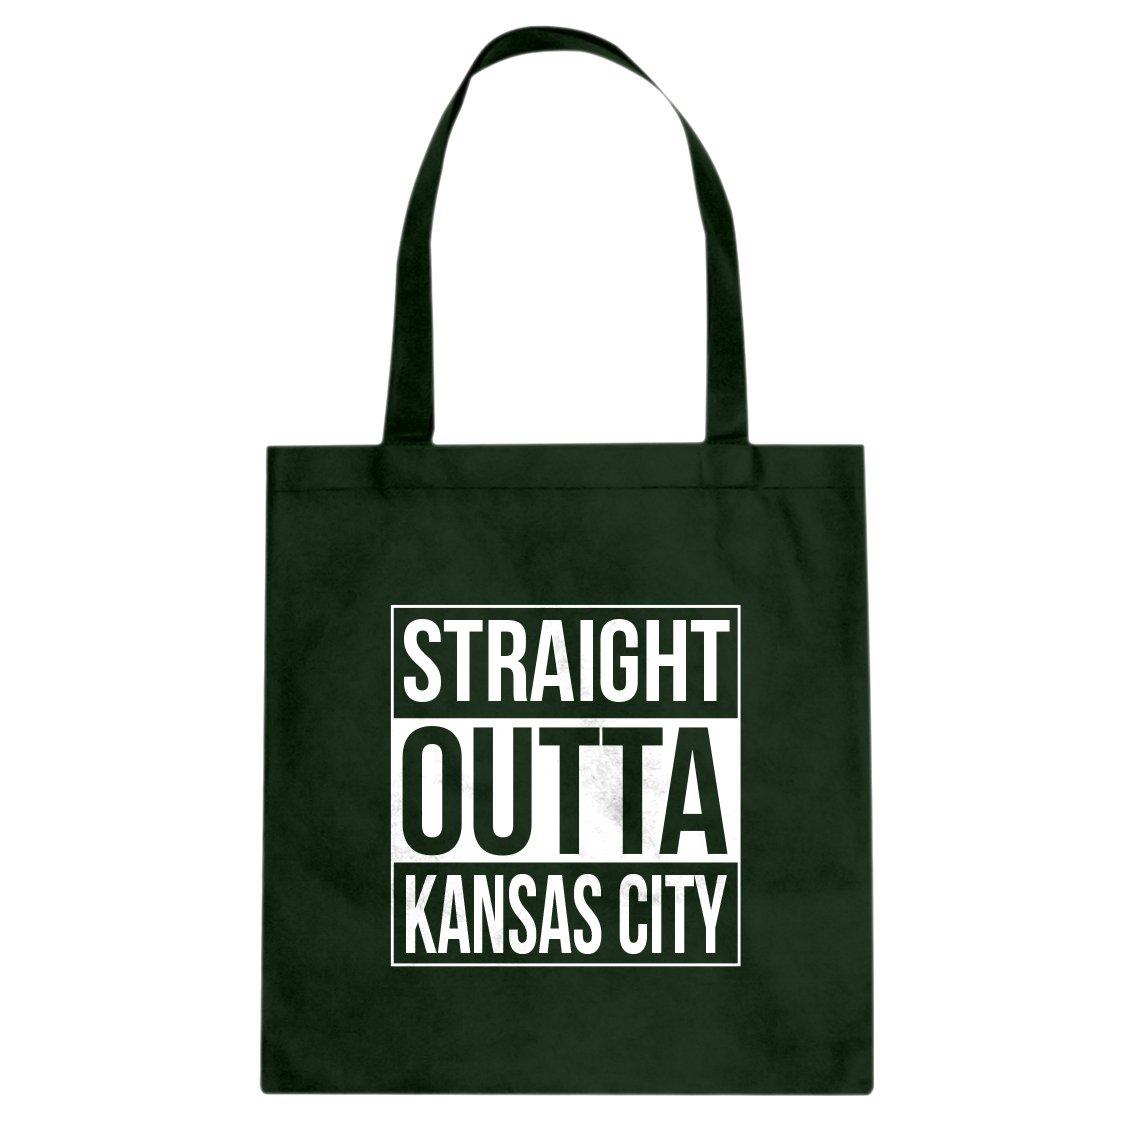 Indica Plateau Straight Outta Kansas City Cotton Canvas Tote Bag